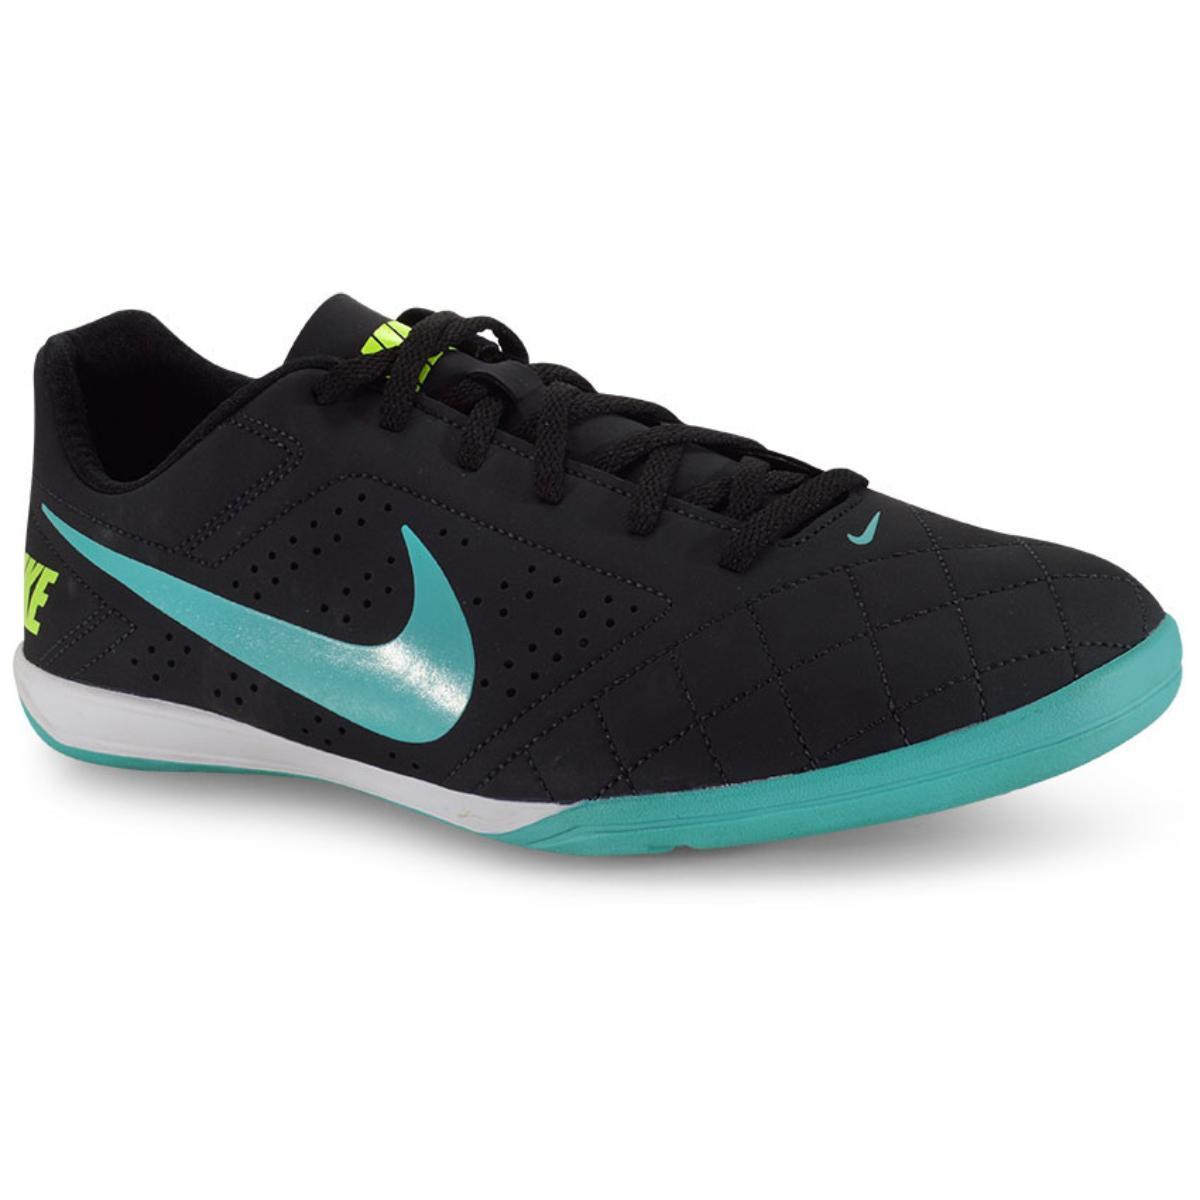 Tênis Masculino Nike 646433-002 Beco 2 Preto/turquesa